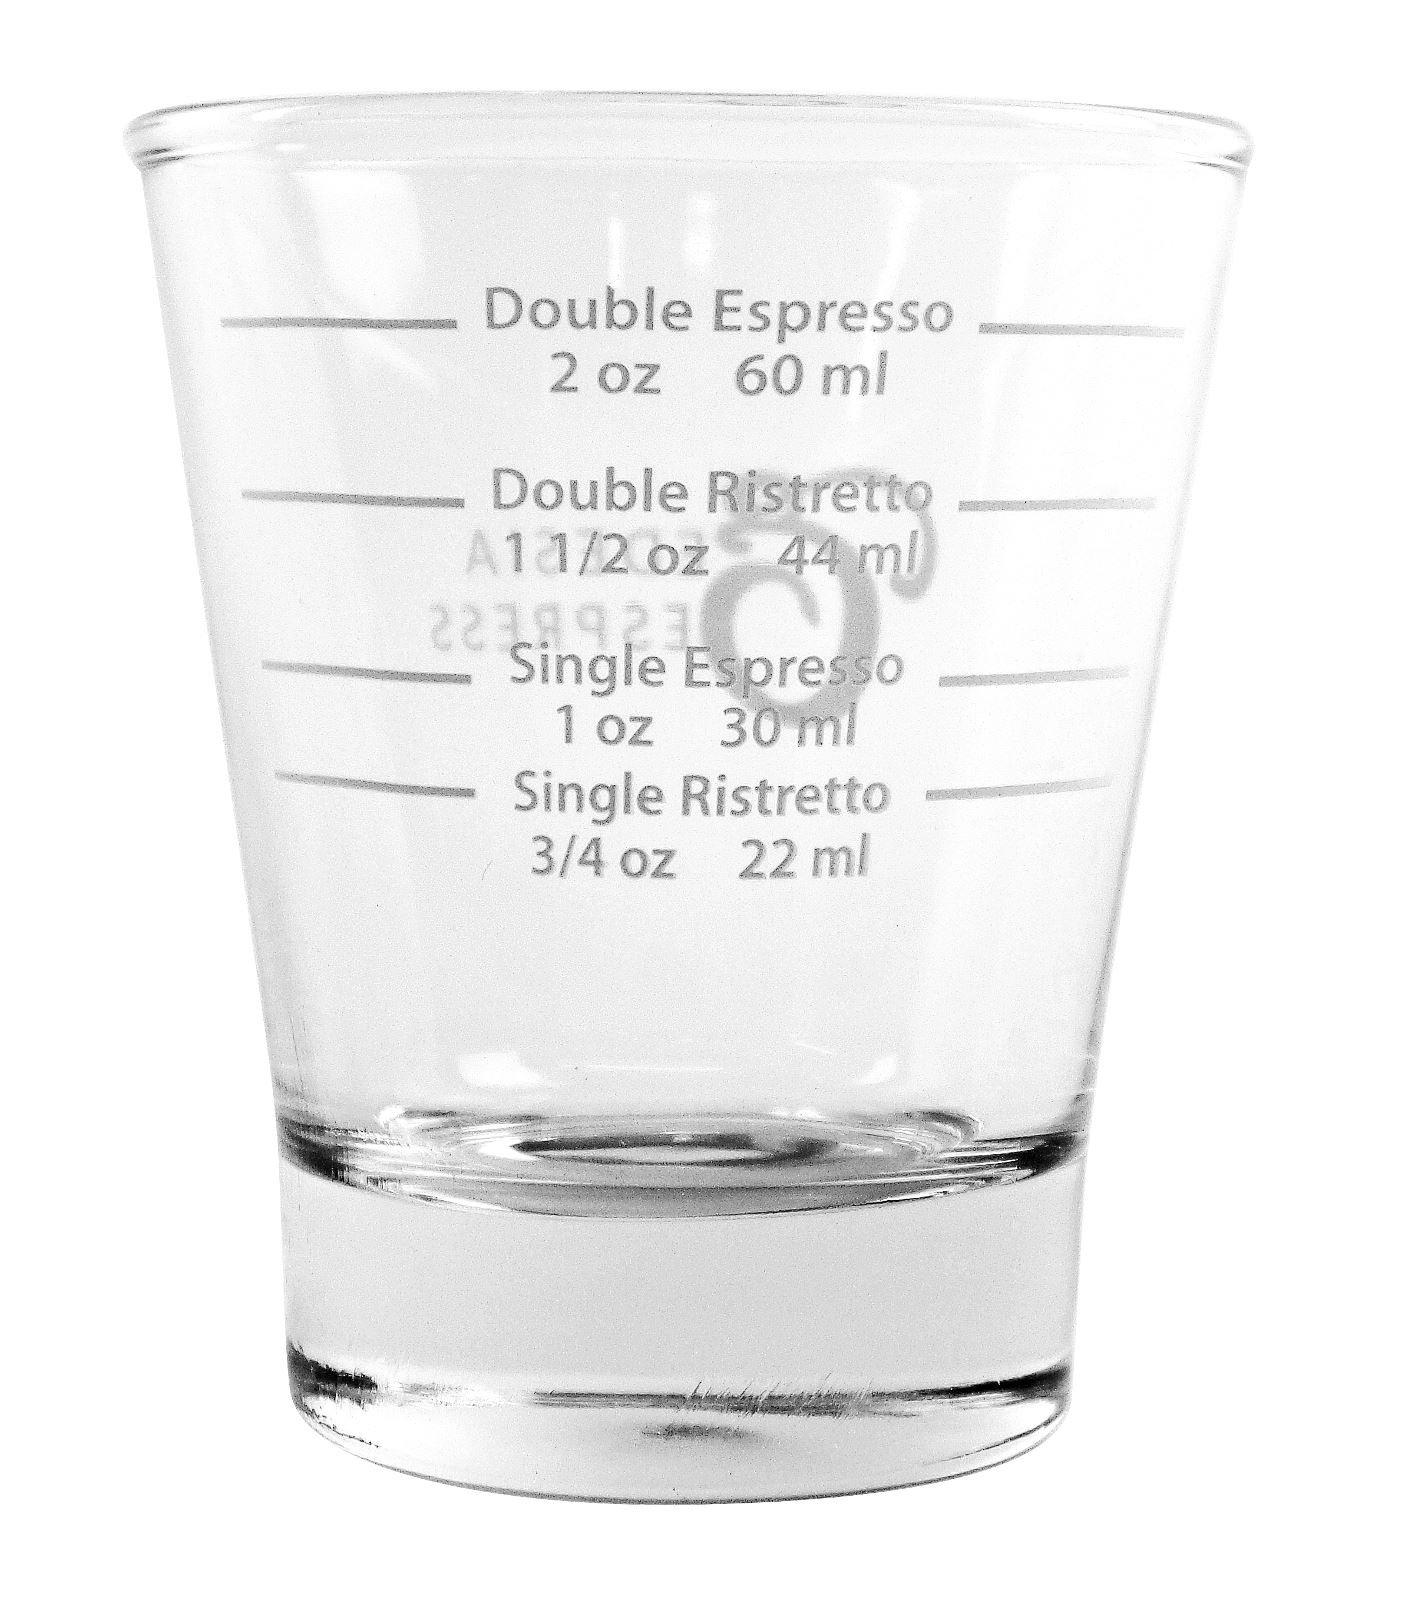 71NMViFCK L - White Lined Espresso Shot Glass Measure for Coffee Espresso Machines - 85ml - by EDESIA ESPRESS